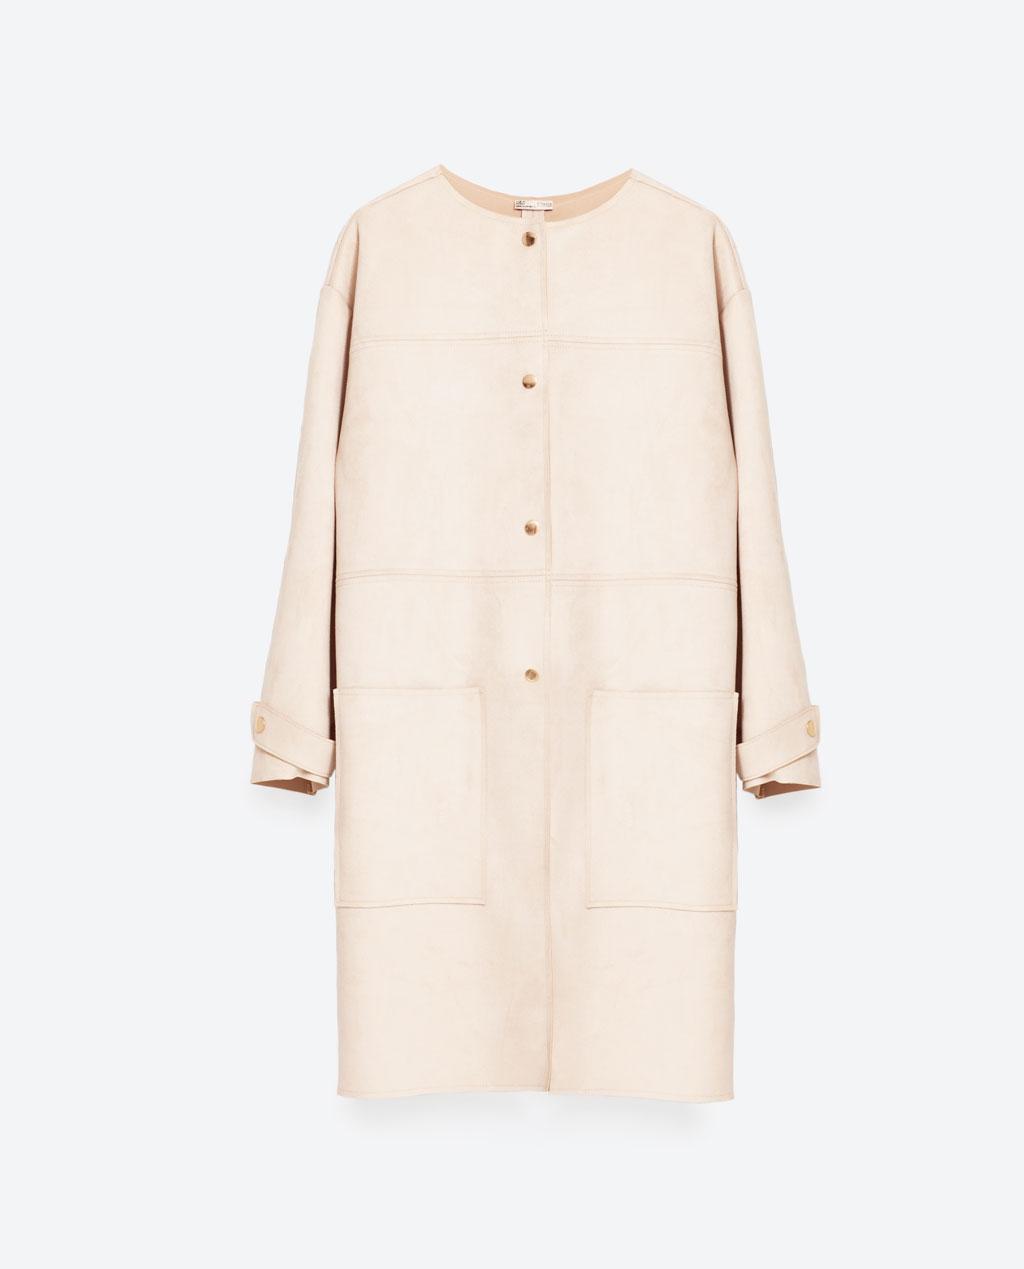 faux suede jacket $70